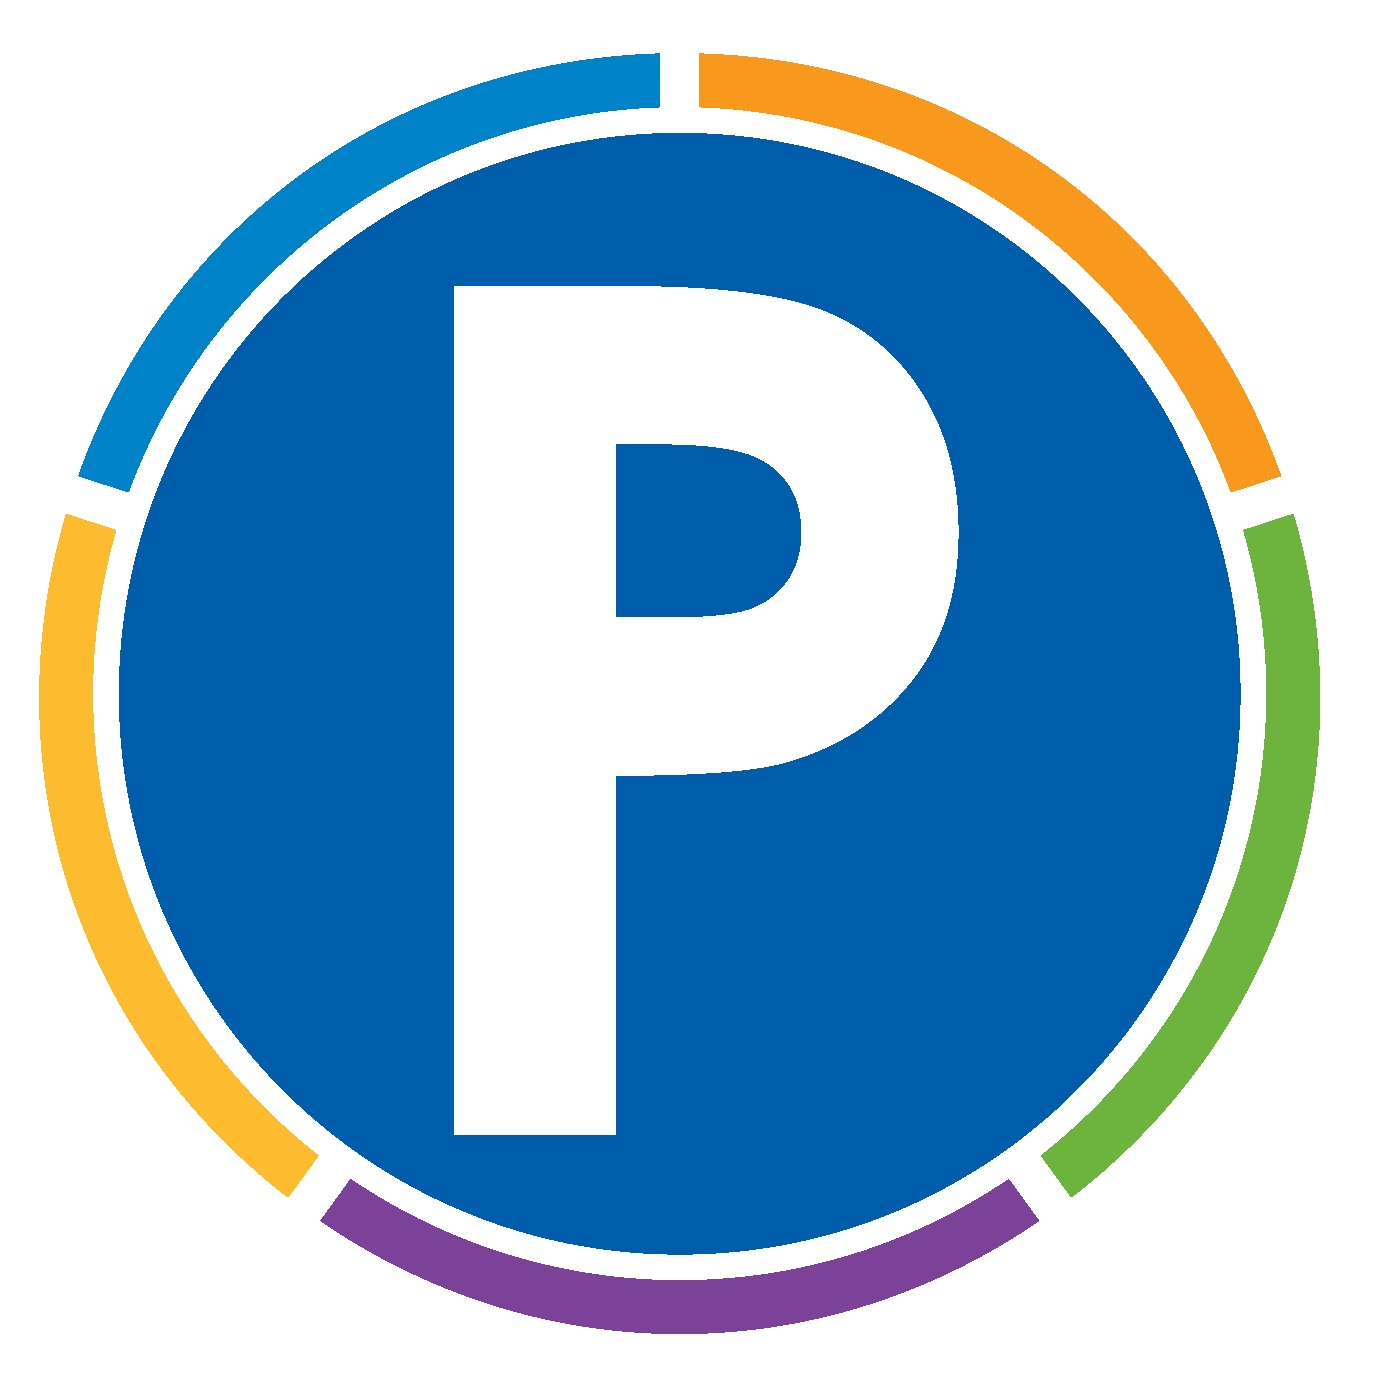 BDA_parking_icon.jpg